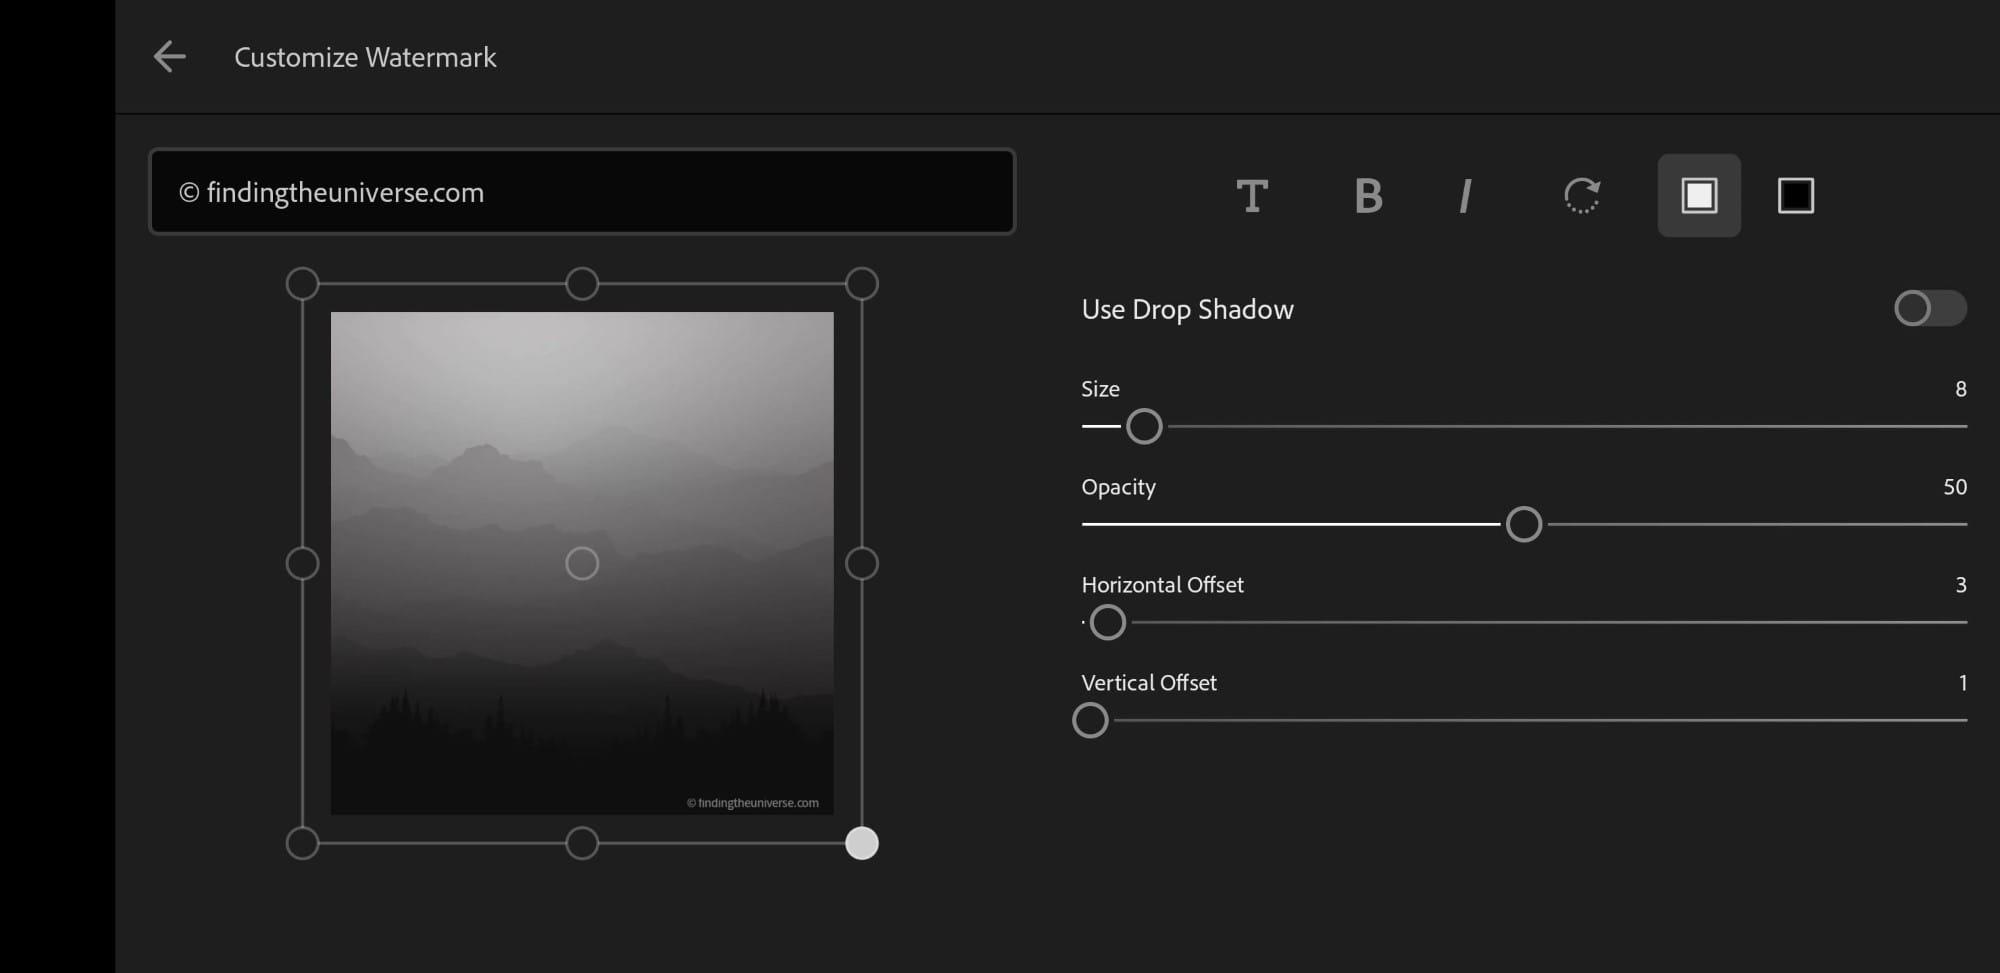 Customize watermark screen Lightroom mobile